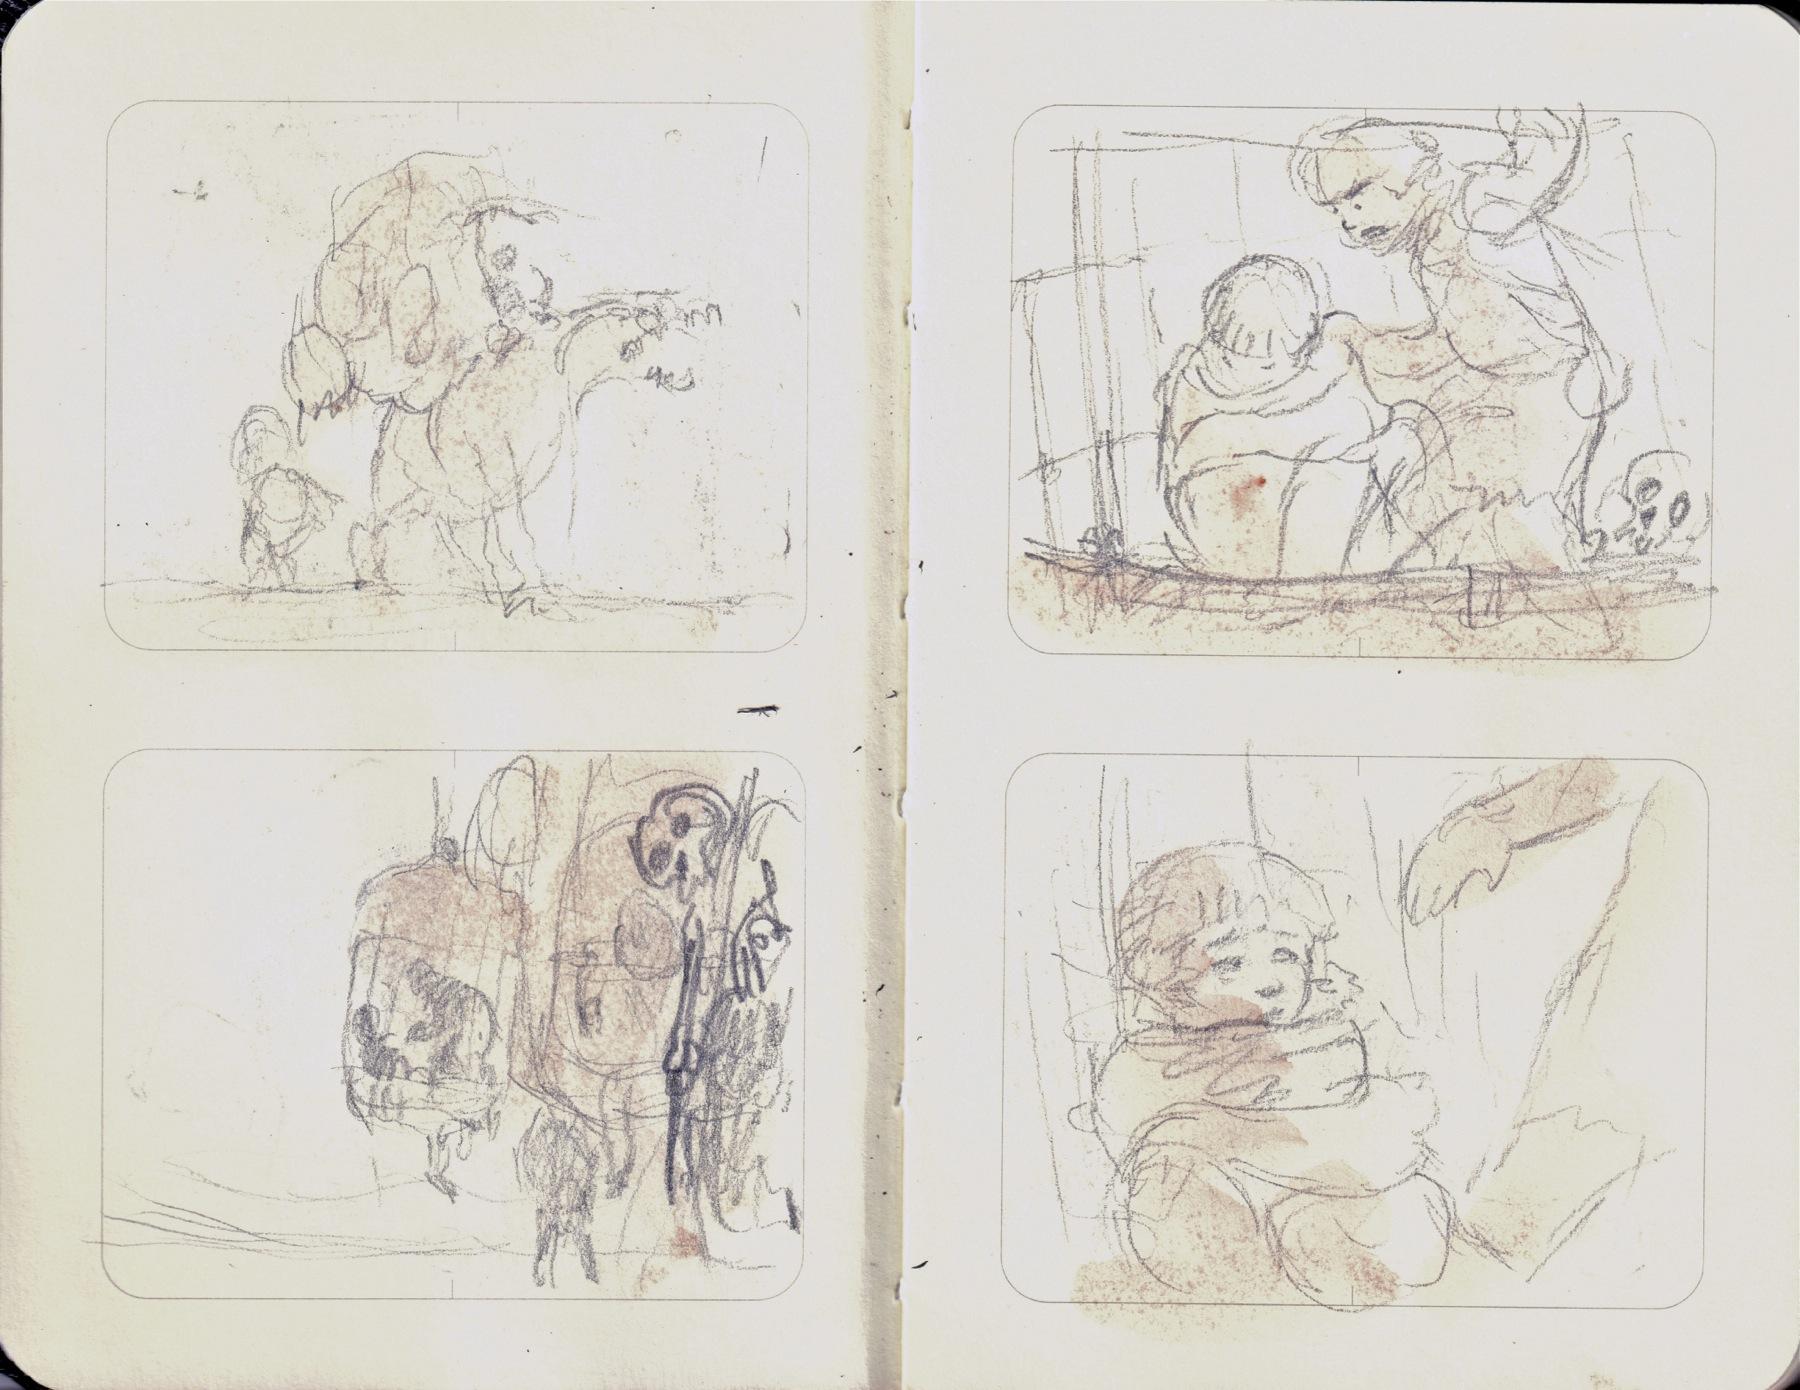 prison storyboards